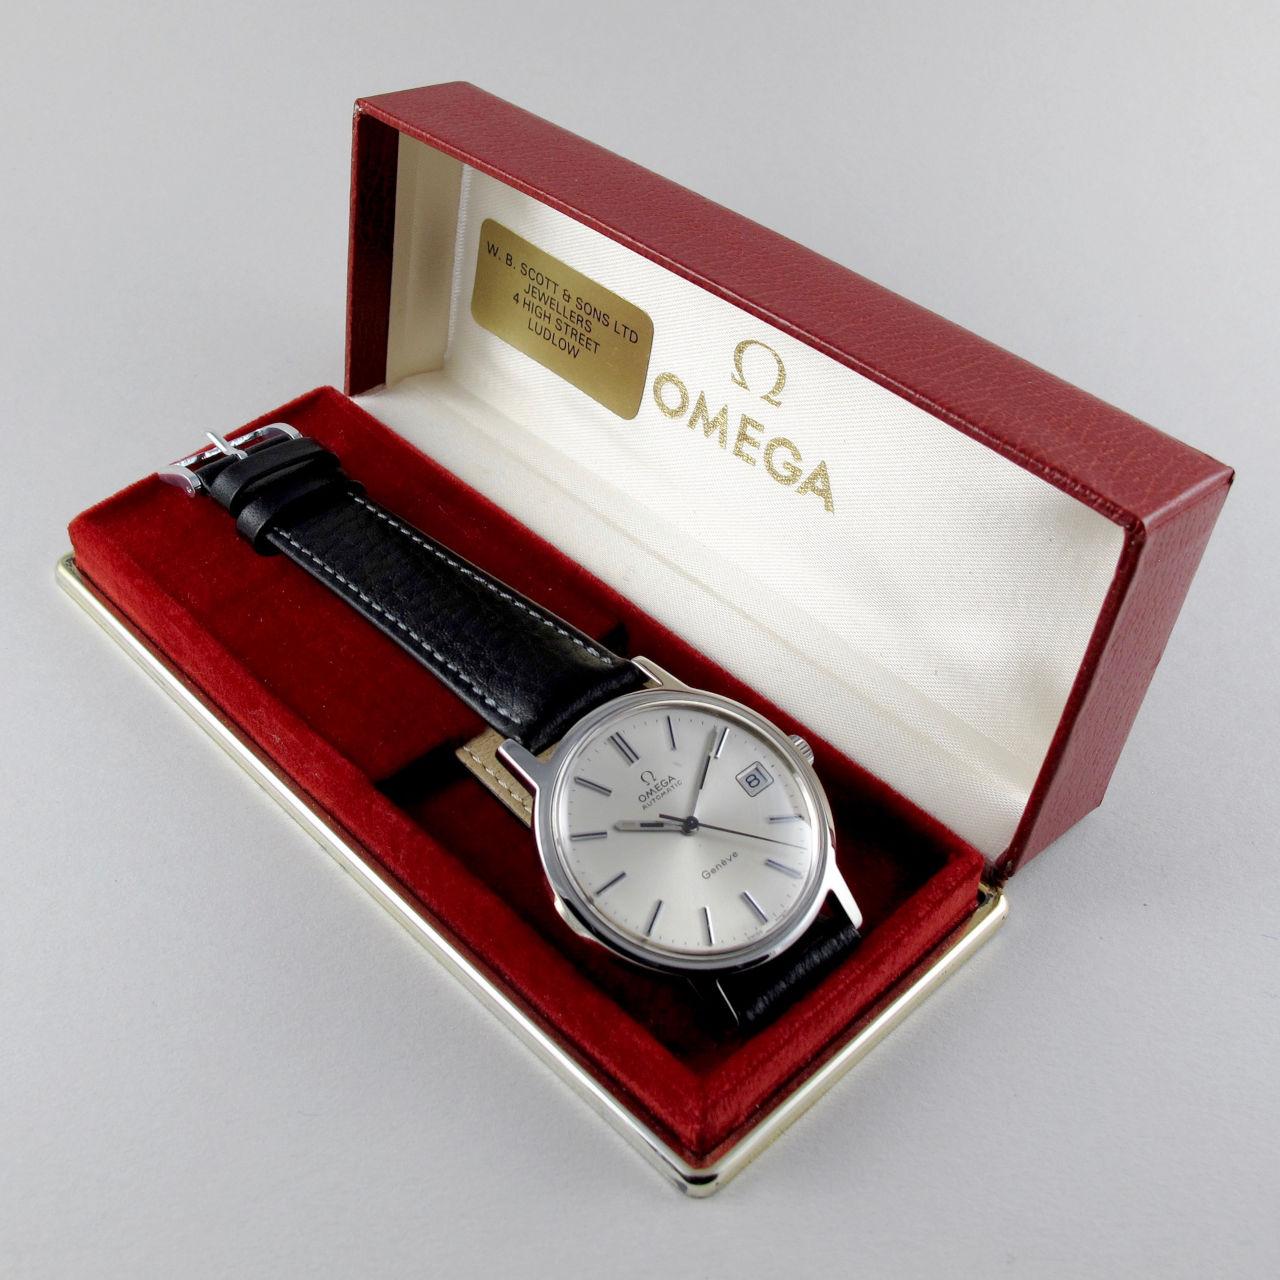 omega-geneve-ref-166-0163-steel-vintage-wristwatch-circa-1973-wwosalu-vb